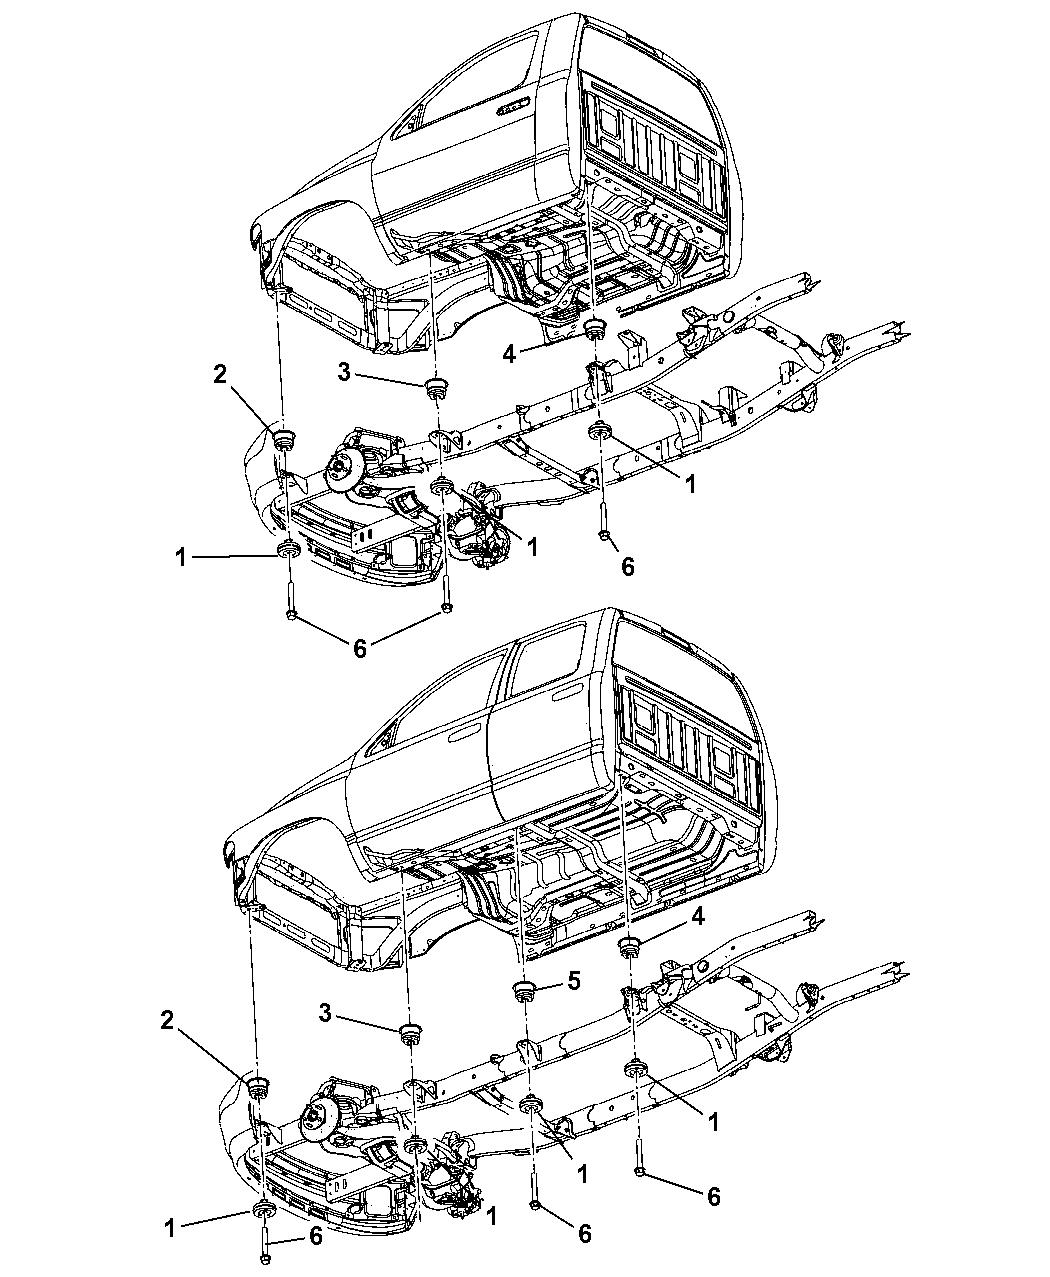 Ram Engine Wiring Diagram on